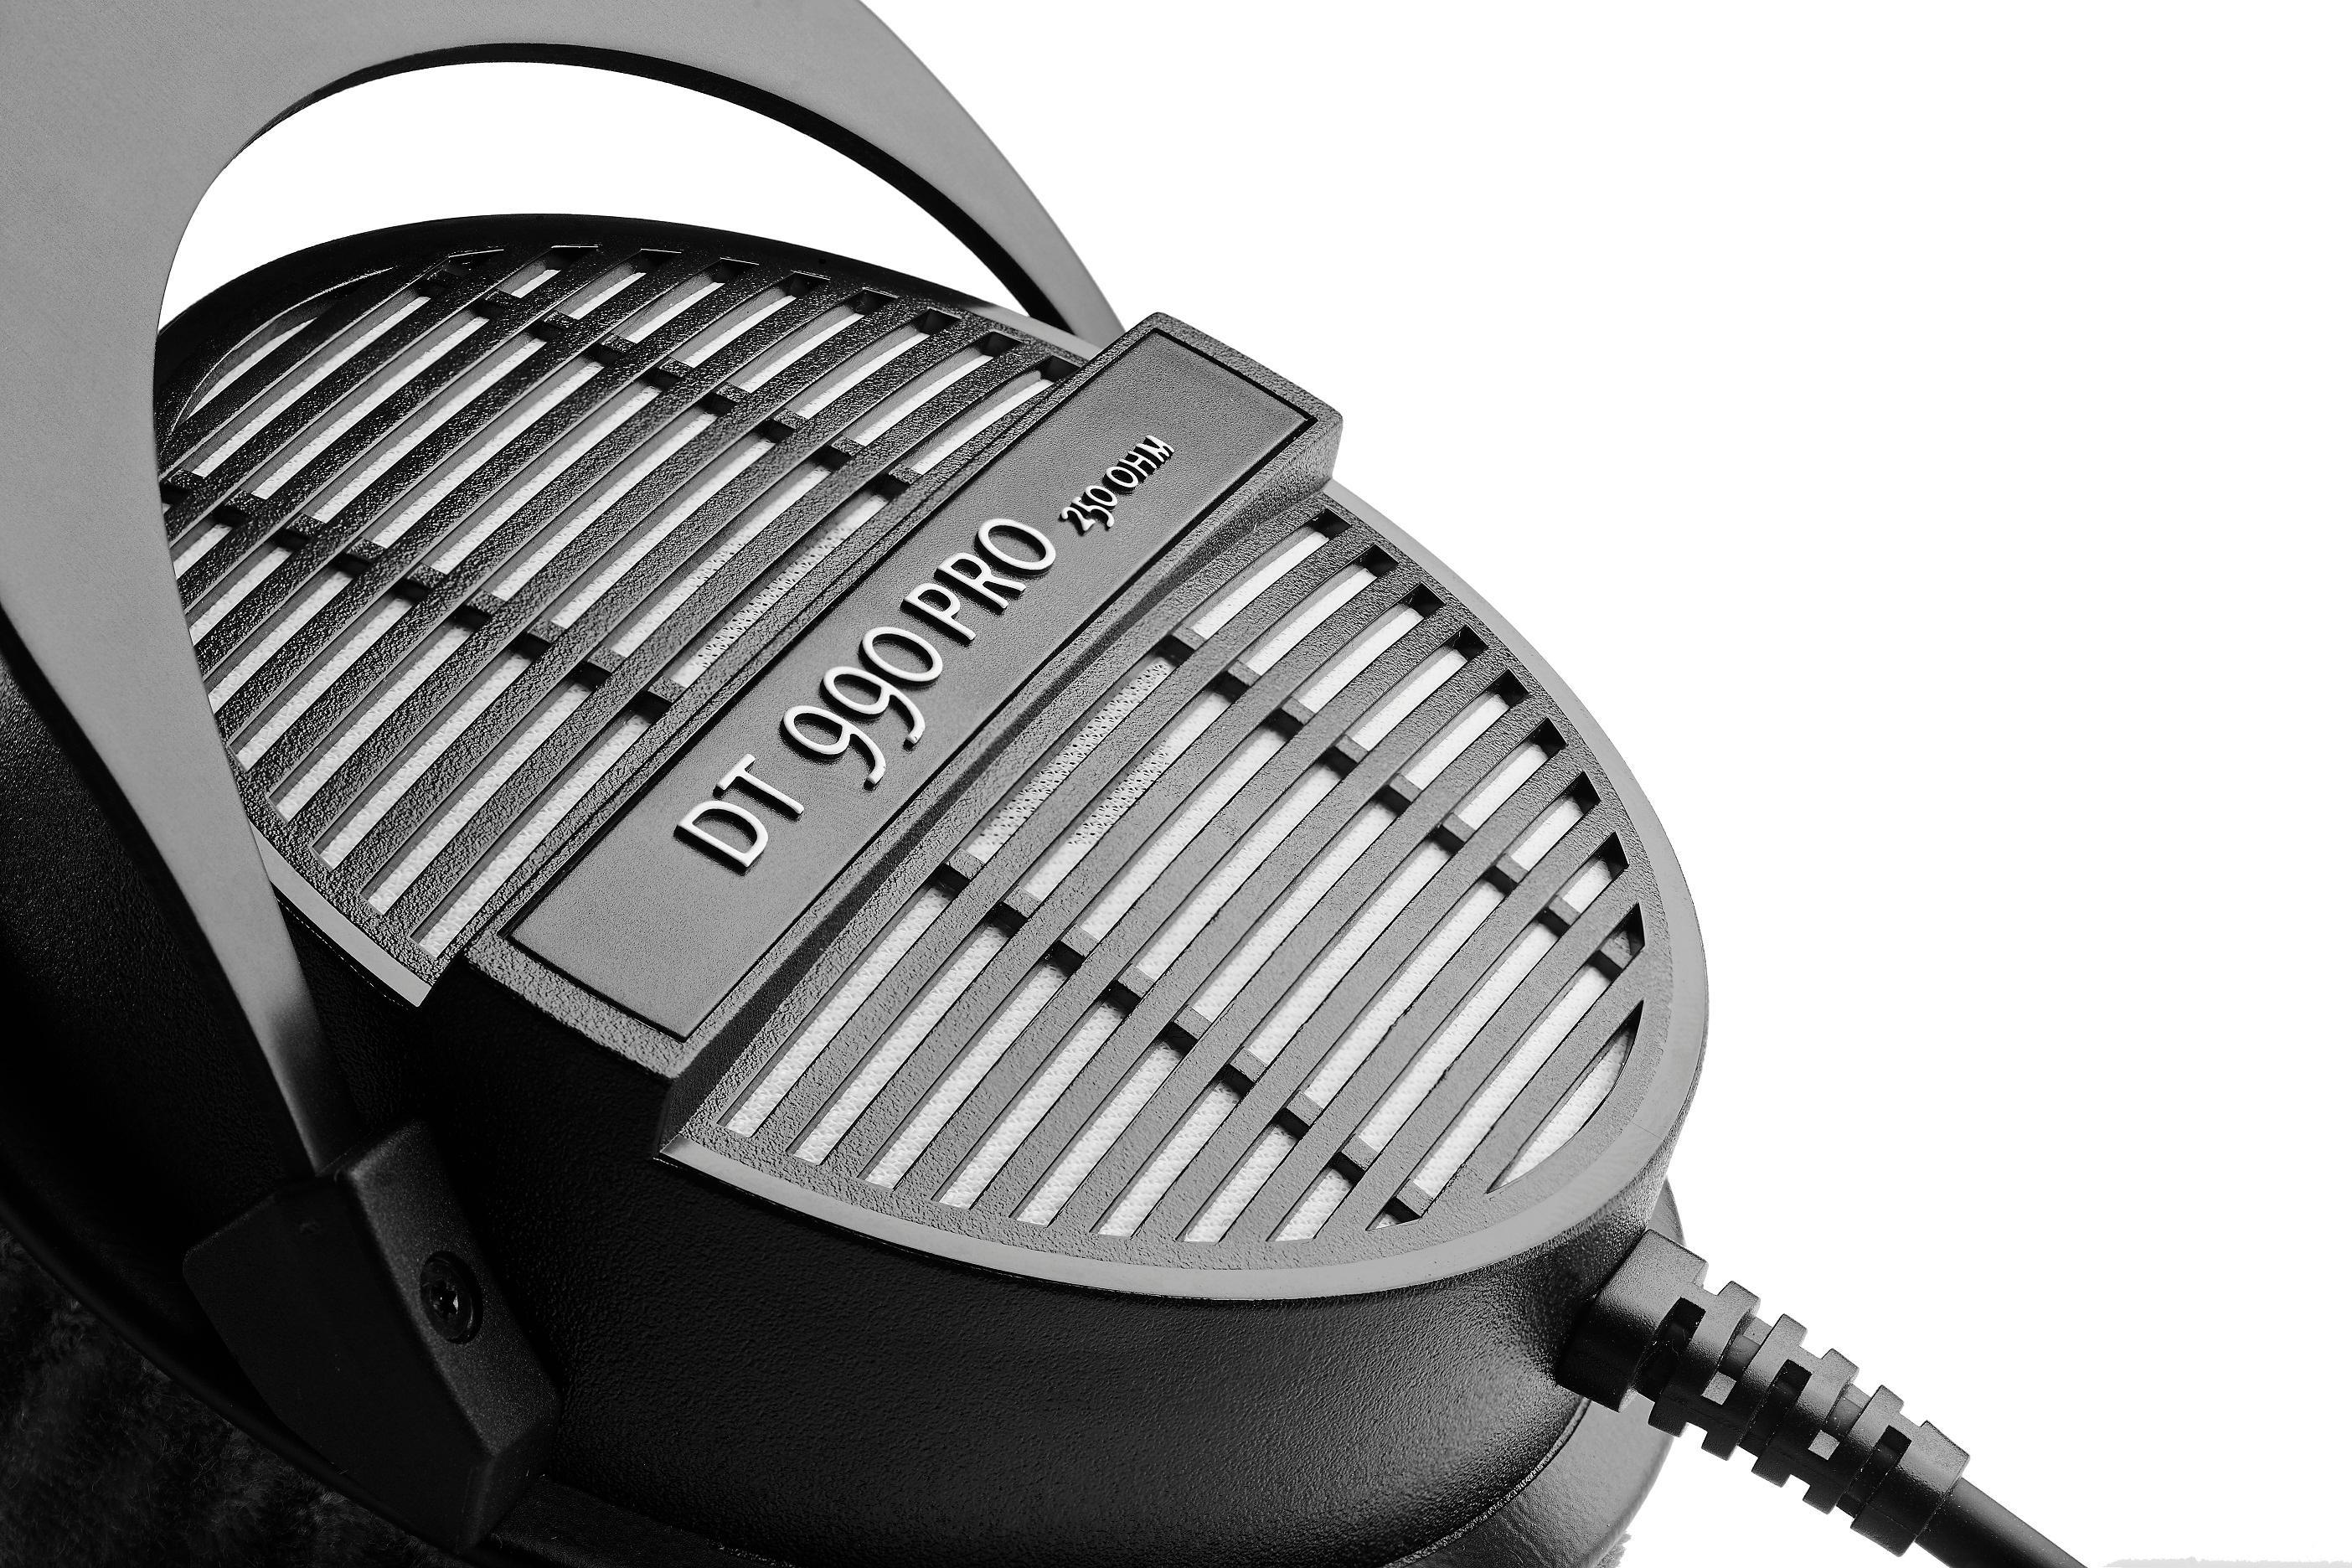 beyerdynamic dt 990 pro 250 professional acoustically open headphones for monitoring. Black Bedroom Furniture Sets. Home Design Ideas